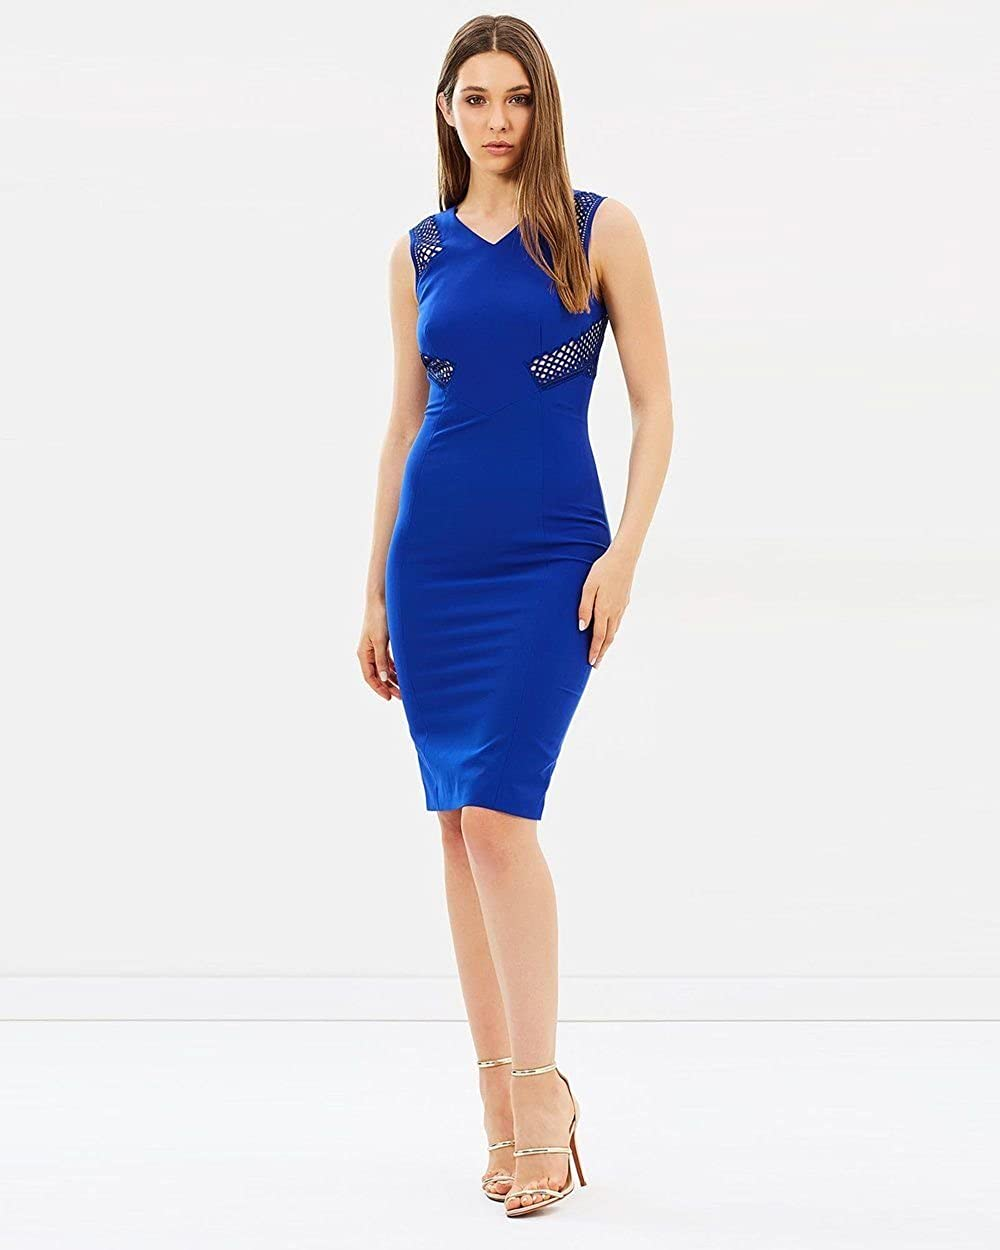 b3ed7e9f2bb Karen Millen Womens Blue Lace Panel Pencil Dress Size 12: Amazon.co.uk:  Clothing